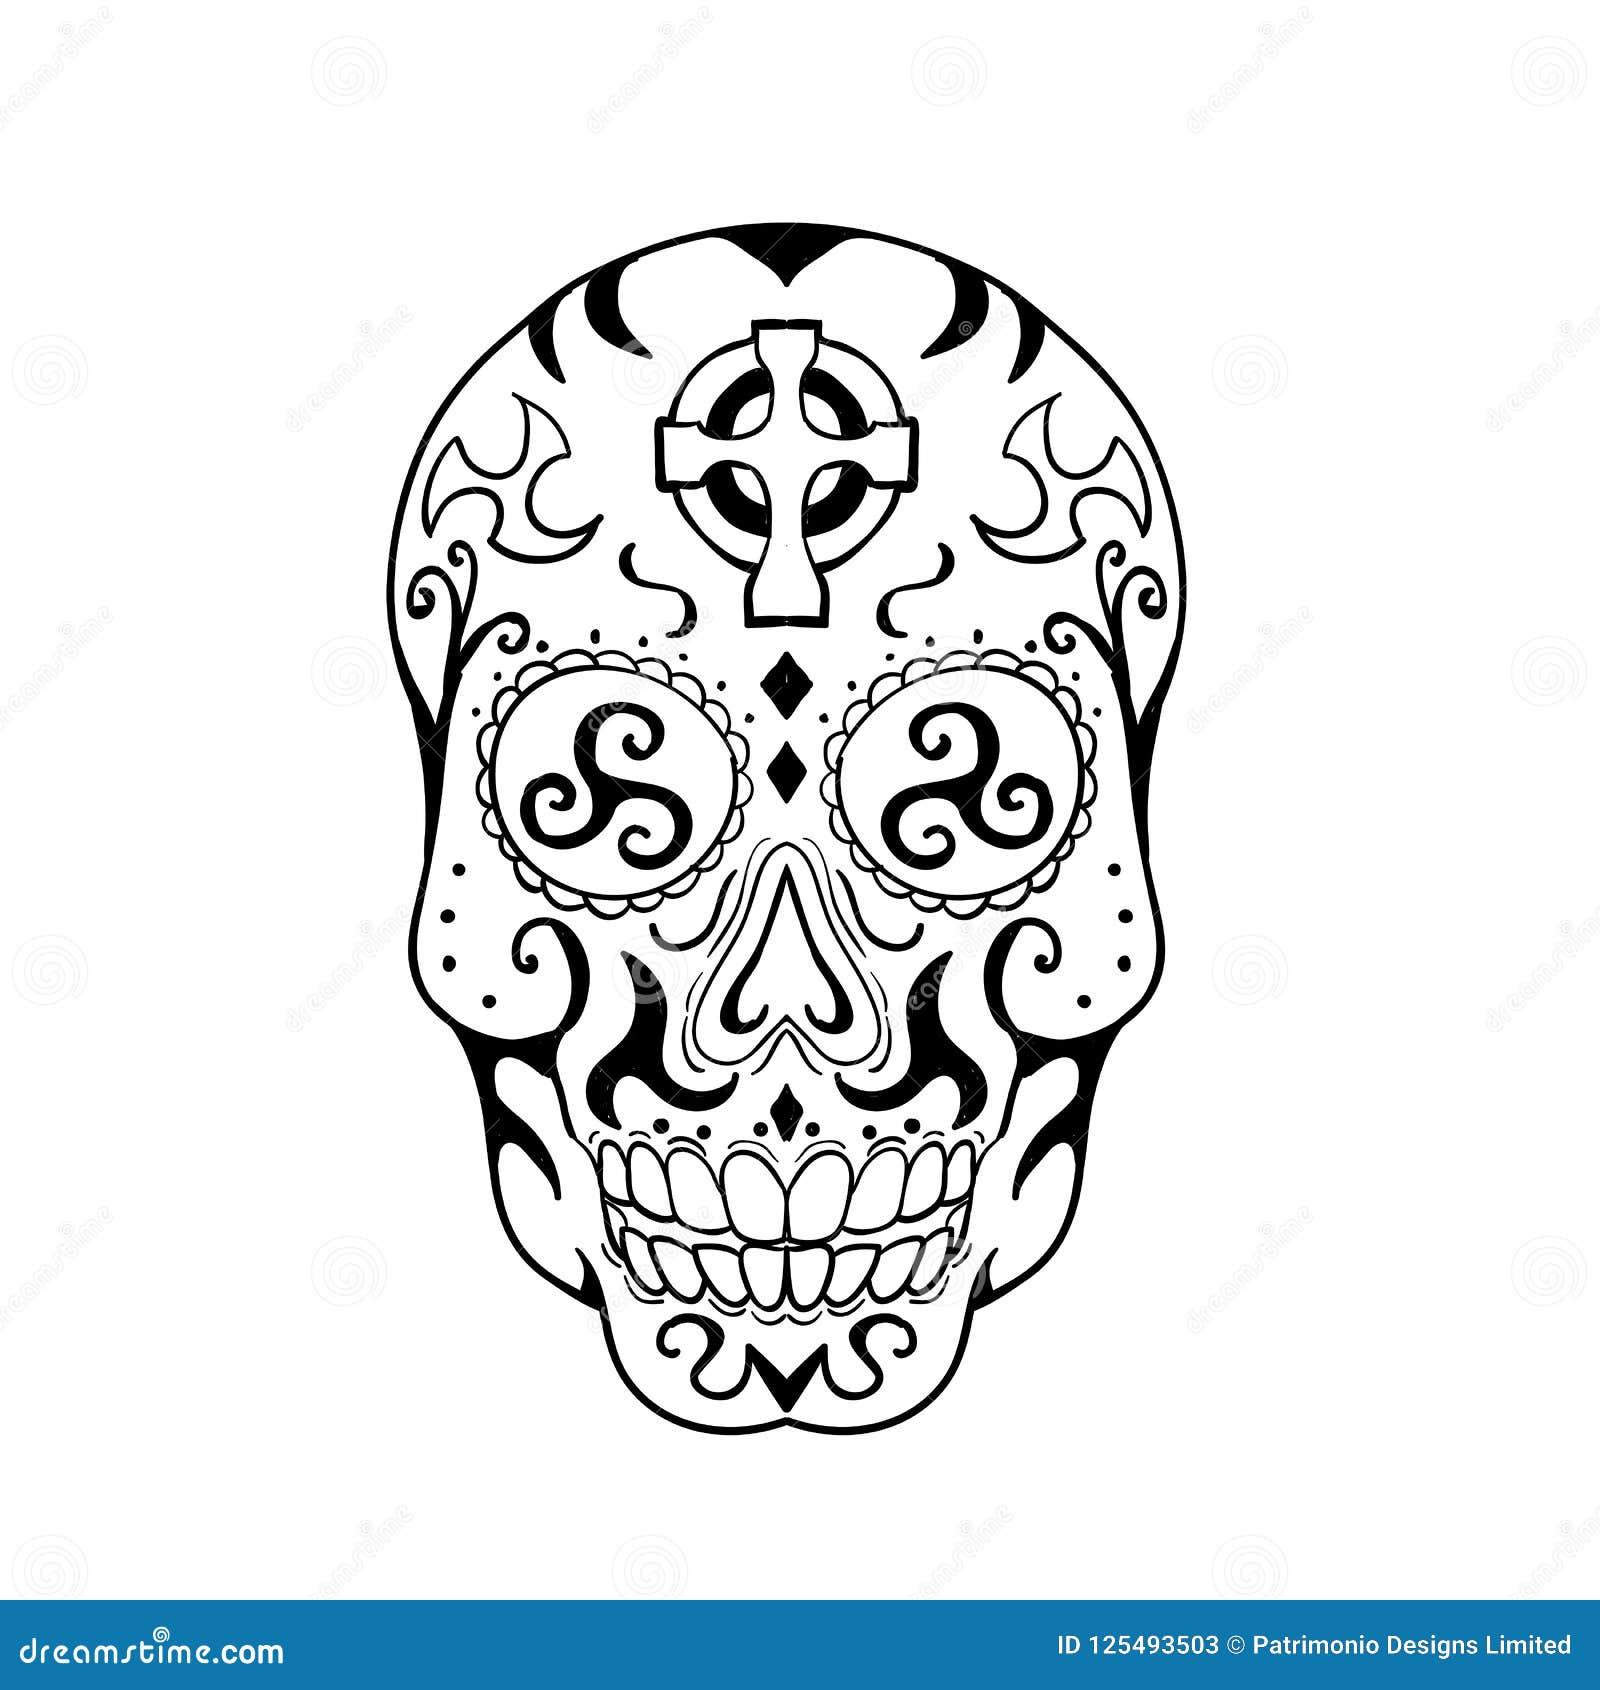 Calavera Tattoo Flash mexican skull triskele celtic cross tattoo stock vector